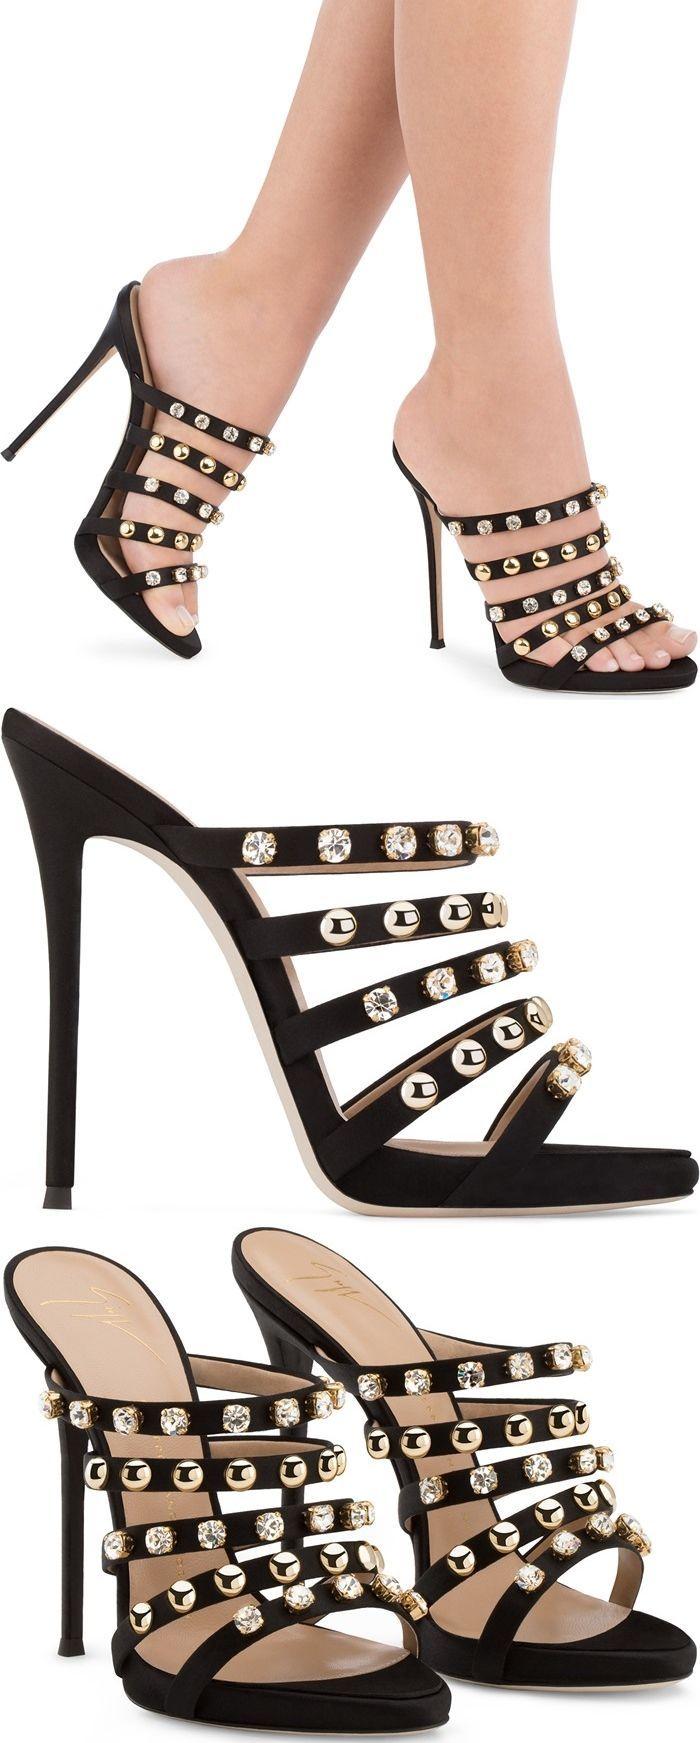 10 Latest Women s Designer Shoes From Giuseppe Zanotti  c530f373db